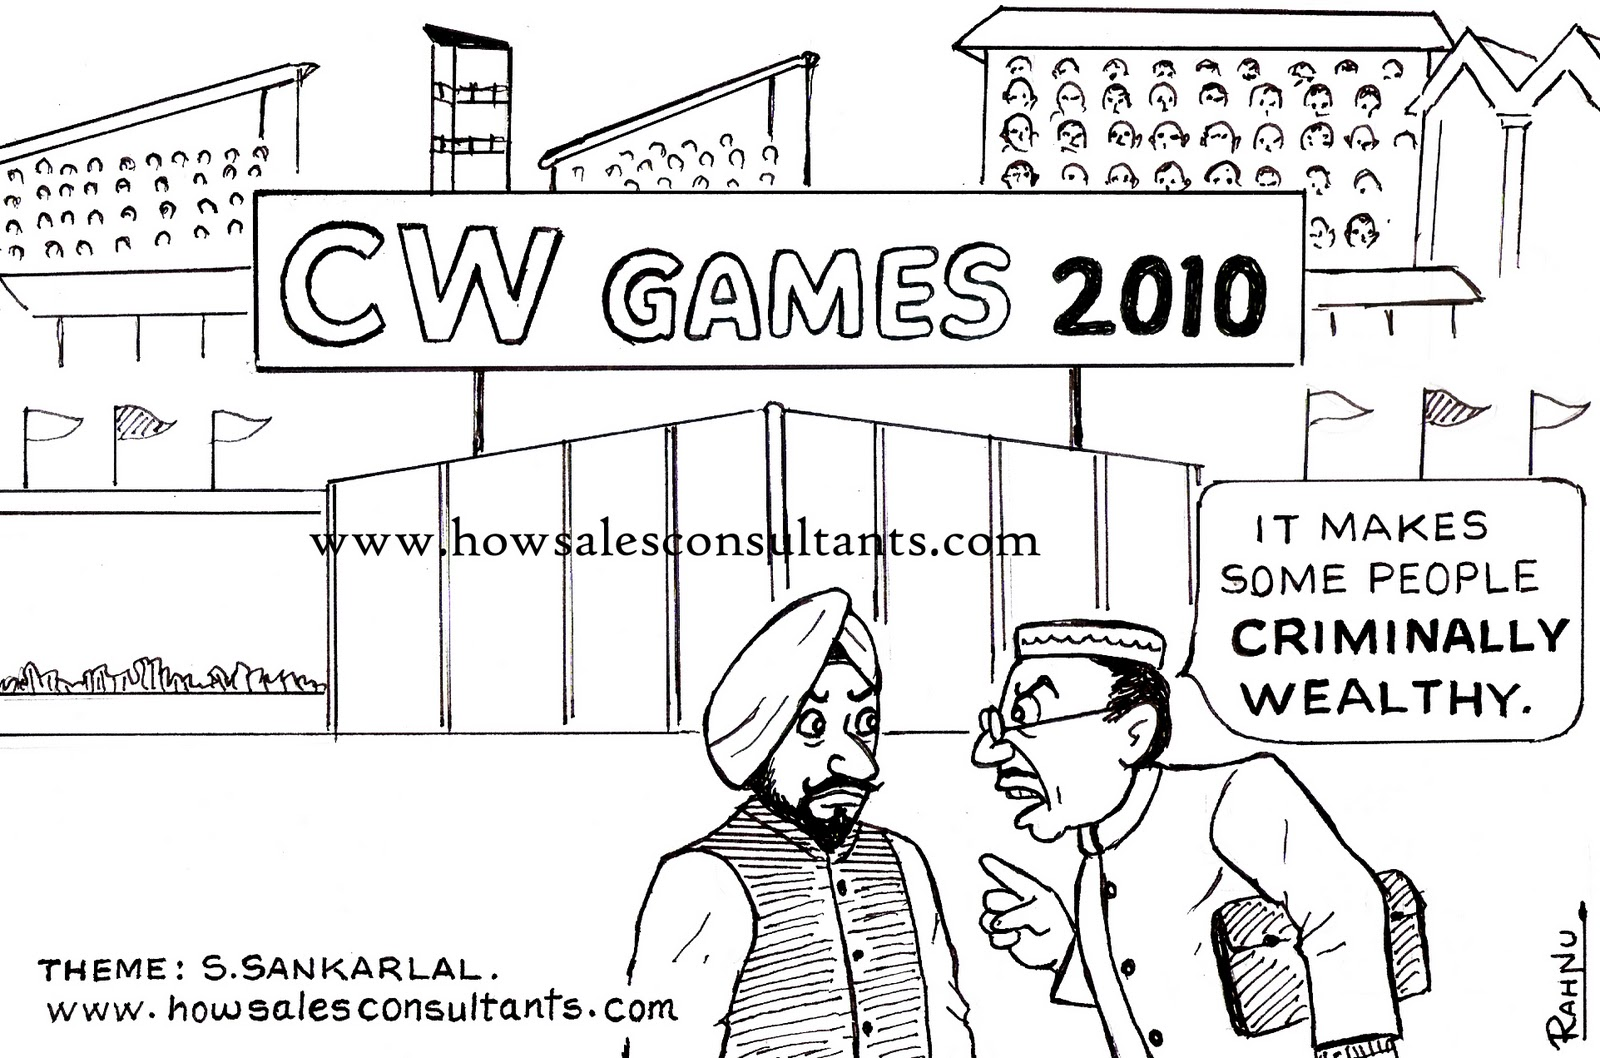 Sankarlal's Cartoons: 10/10